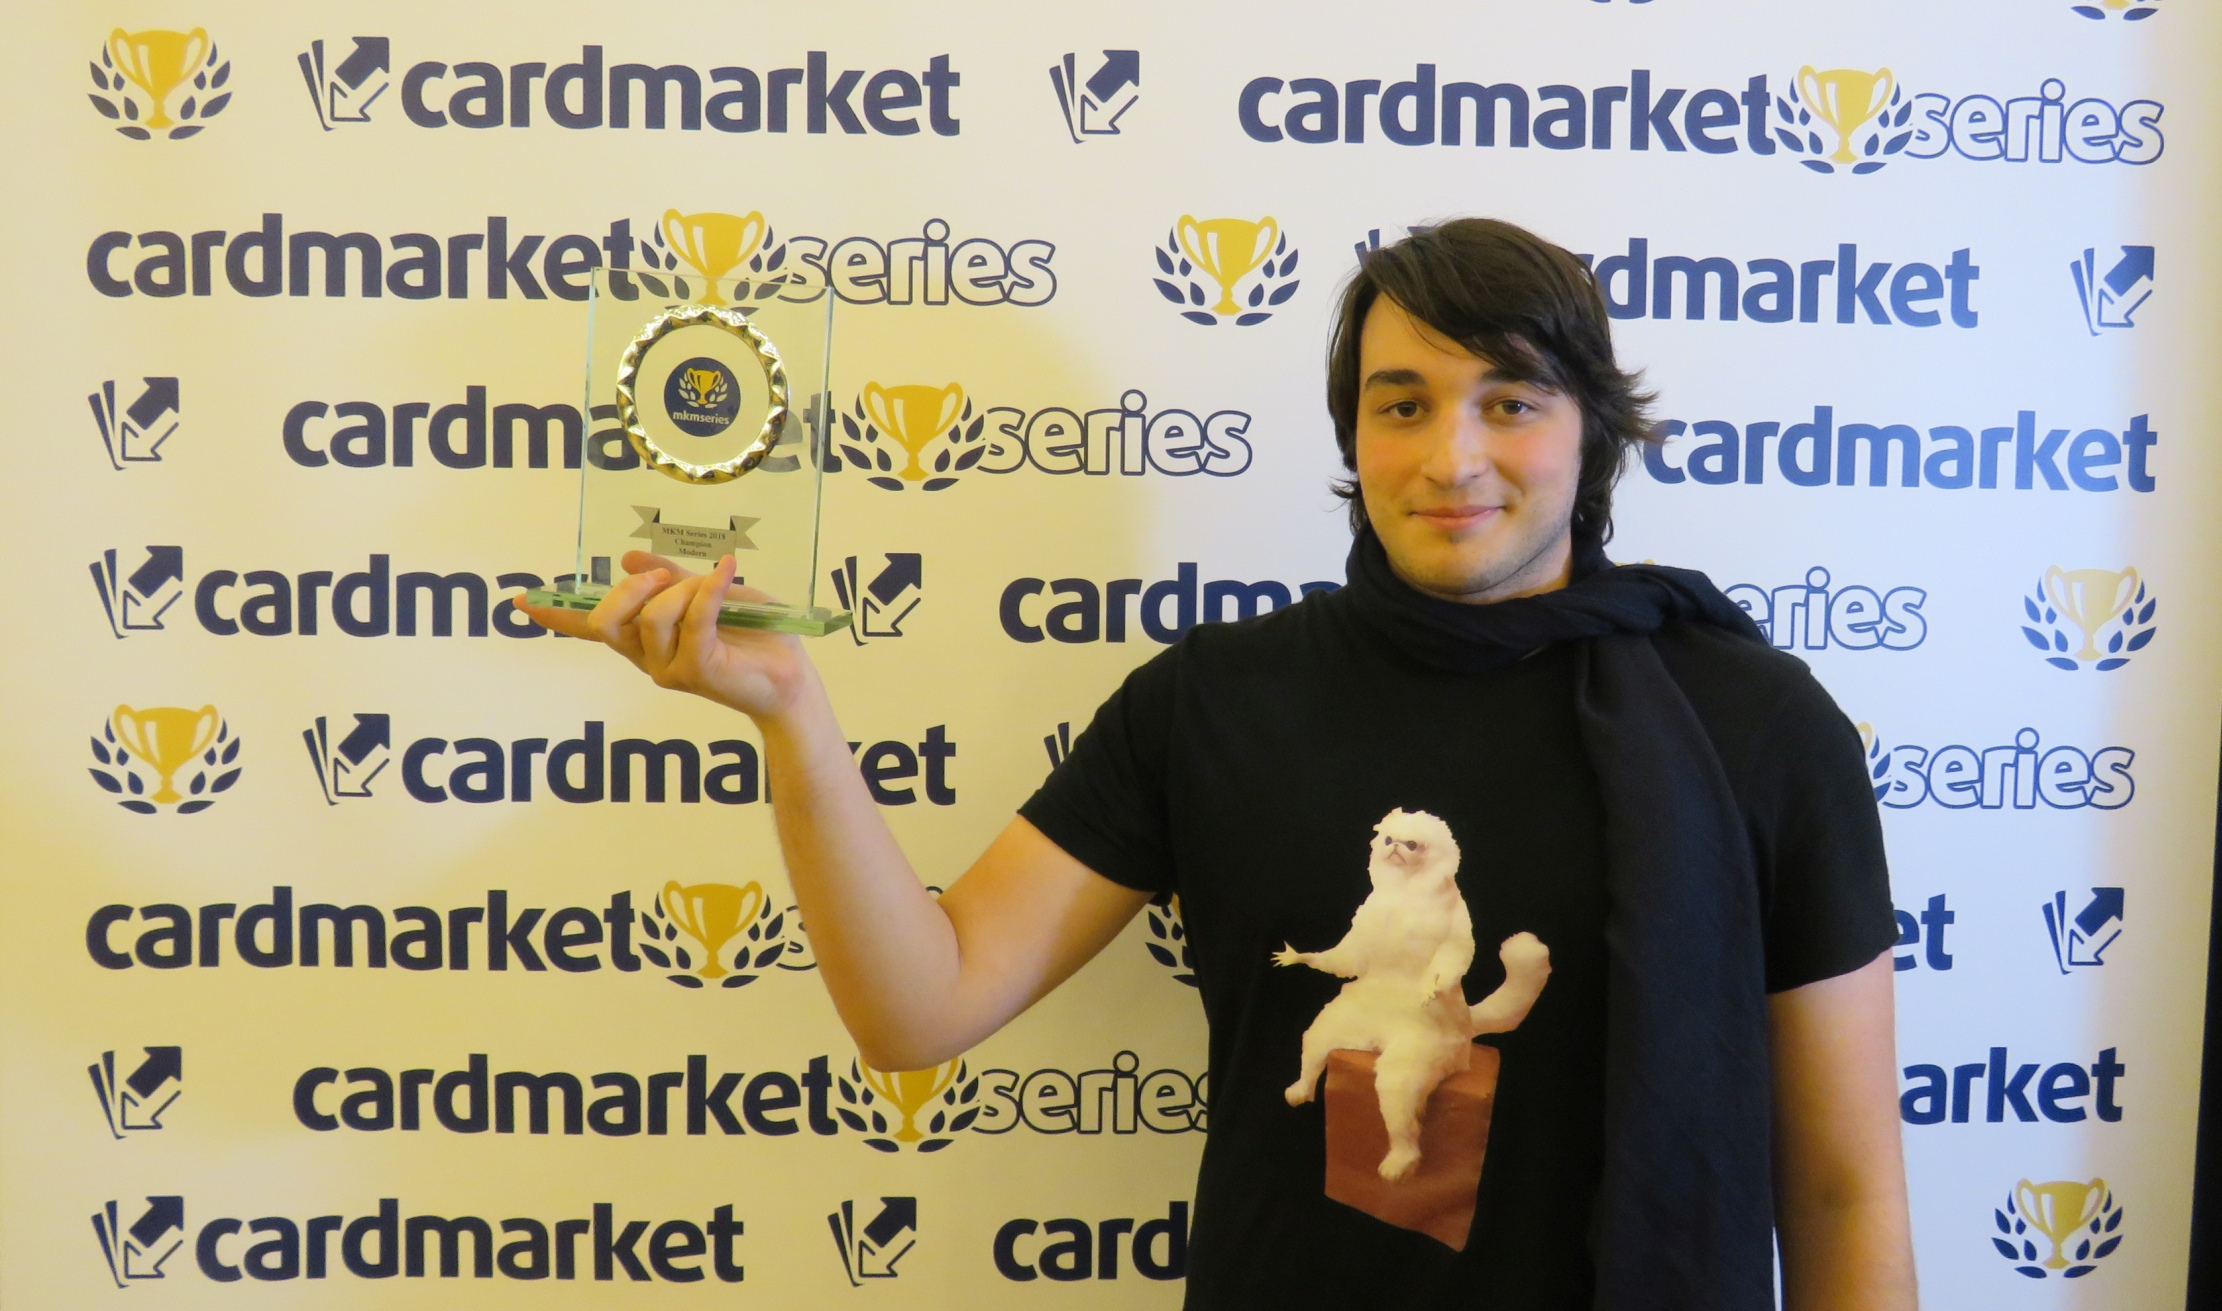 Previously at the Cardmarket Series: Modern in Zaragoza